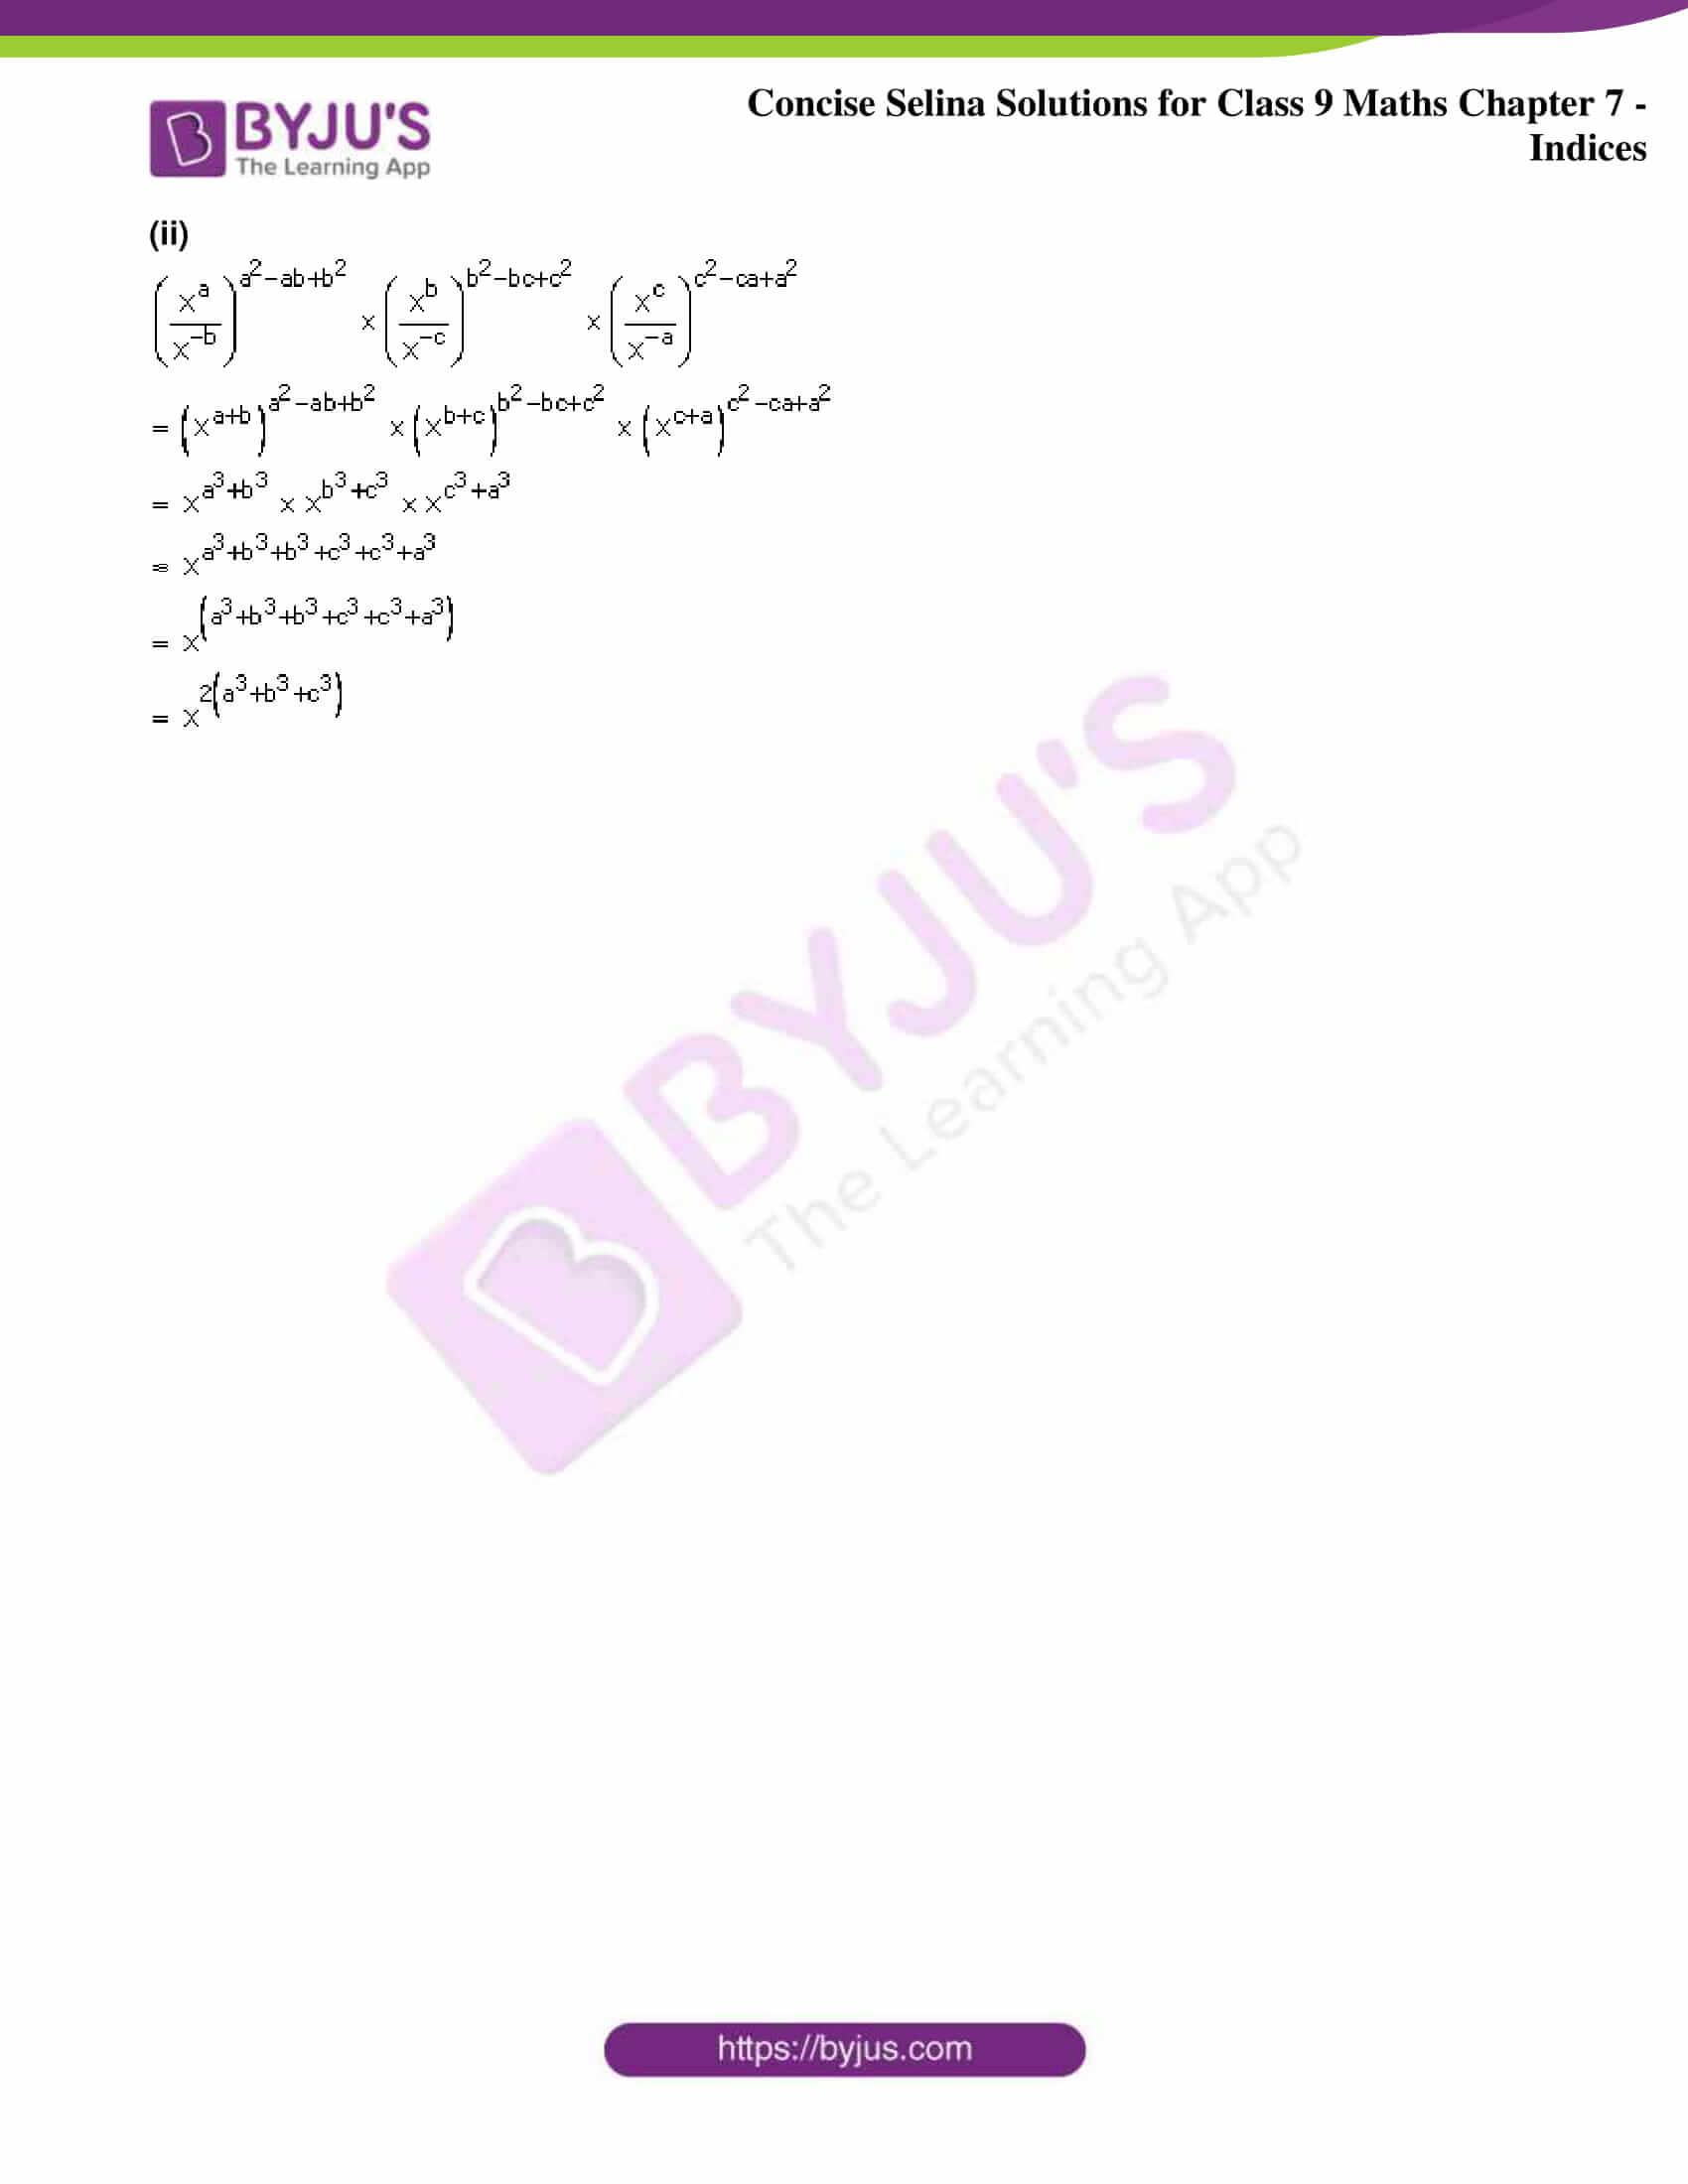 icse class 9 jun8 maths selina solutions chapter 7 indices 08